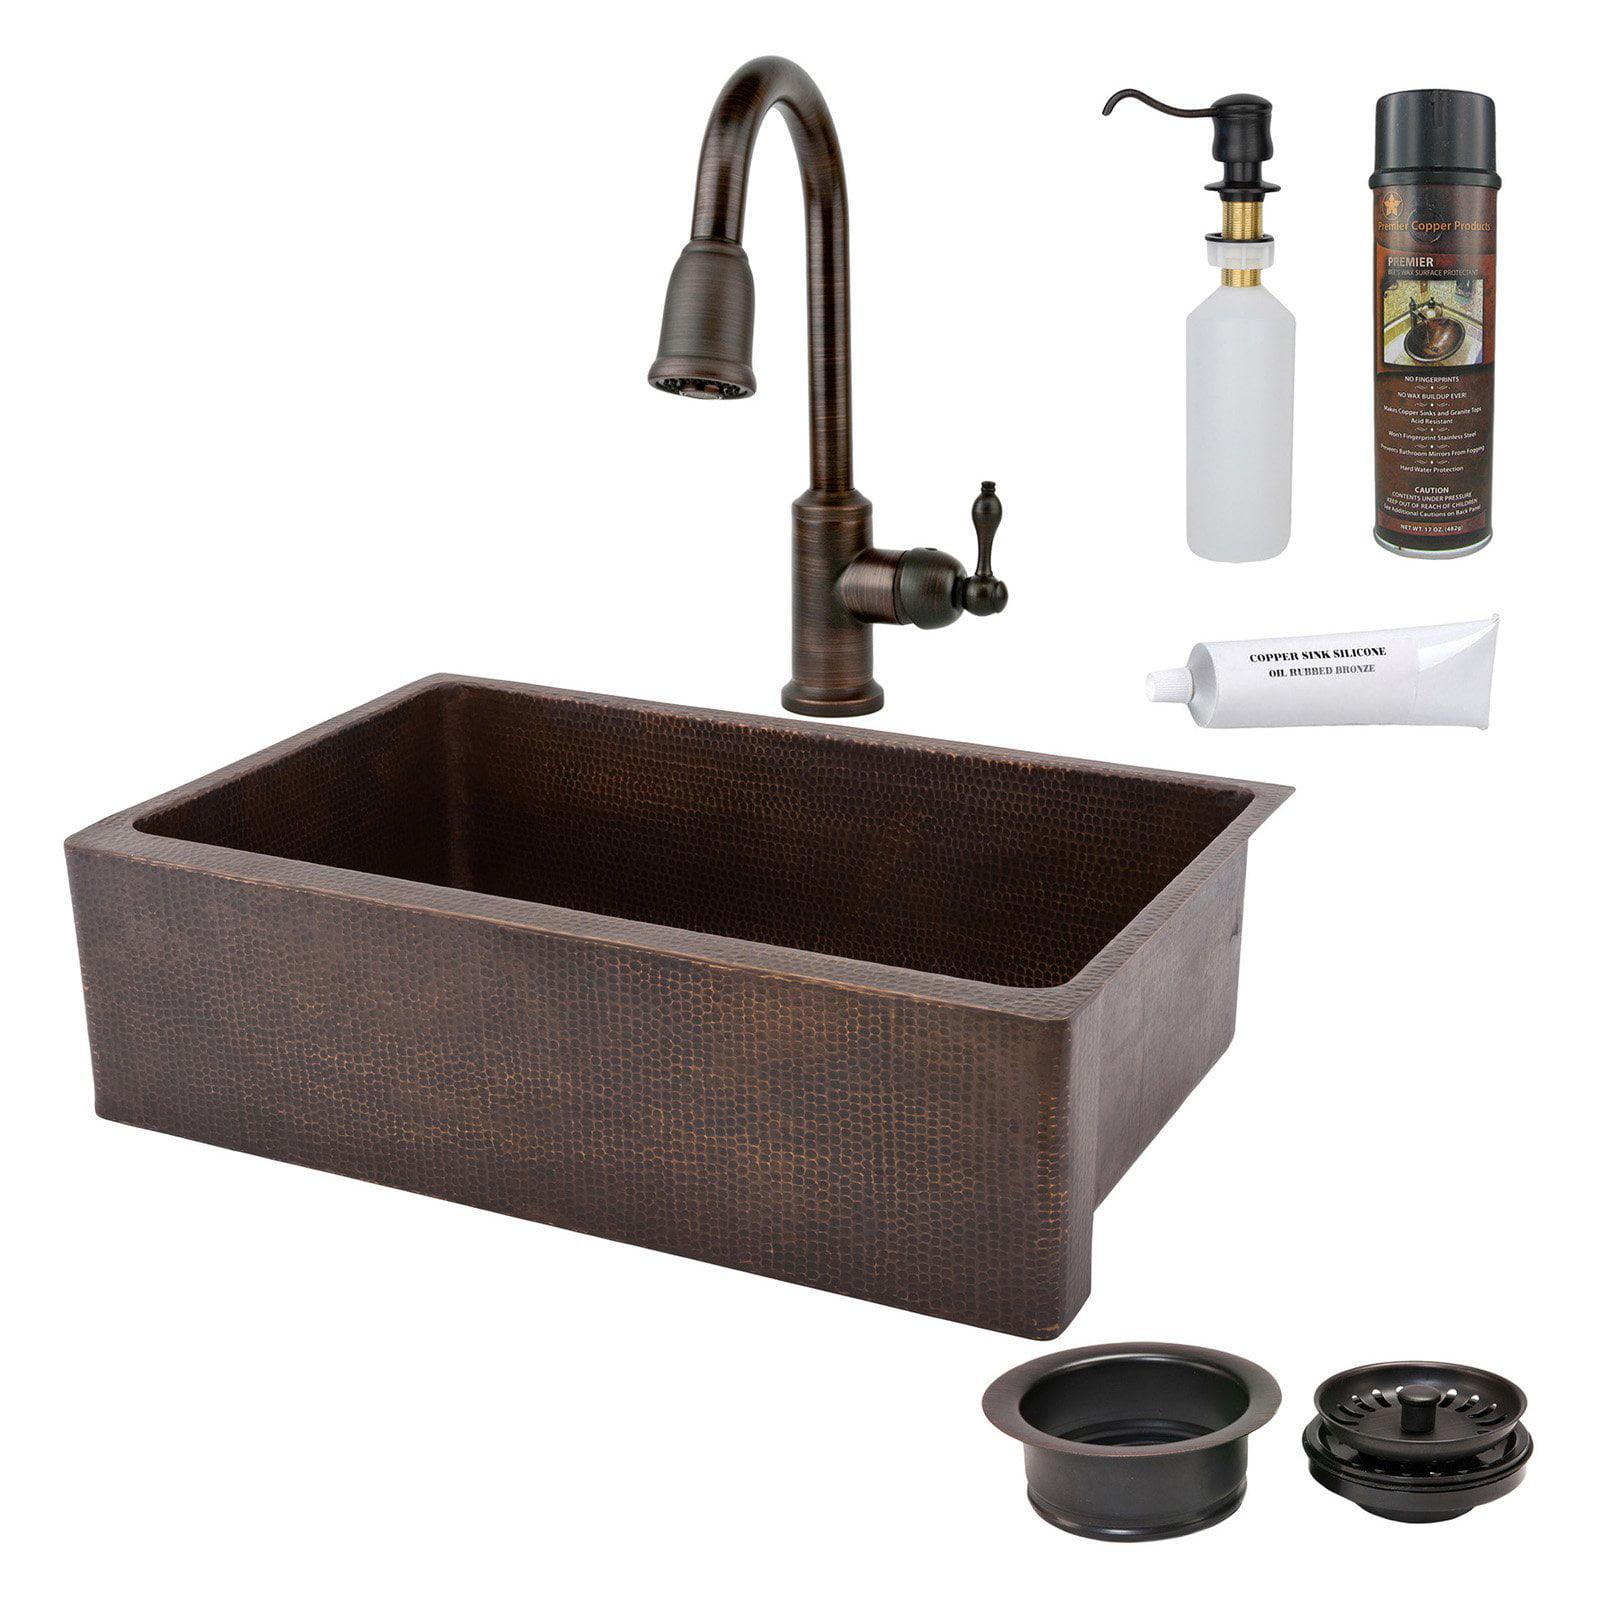 Premier Copper Products KSP2 KASDB33229 Single Basin Farmhouse Sink with Faucet